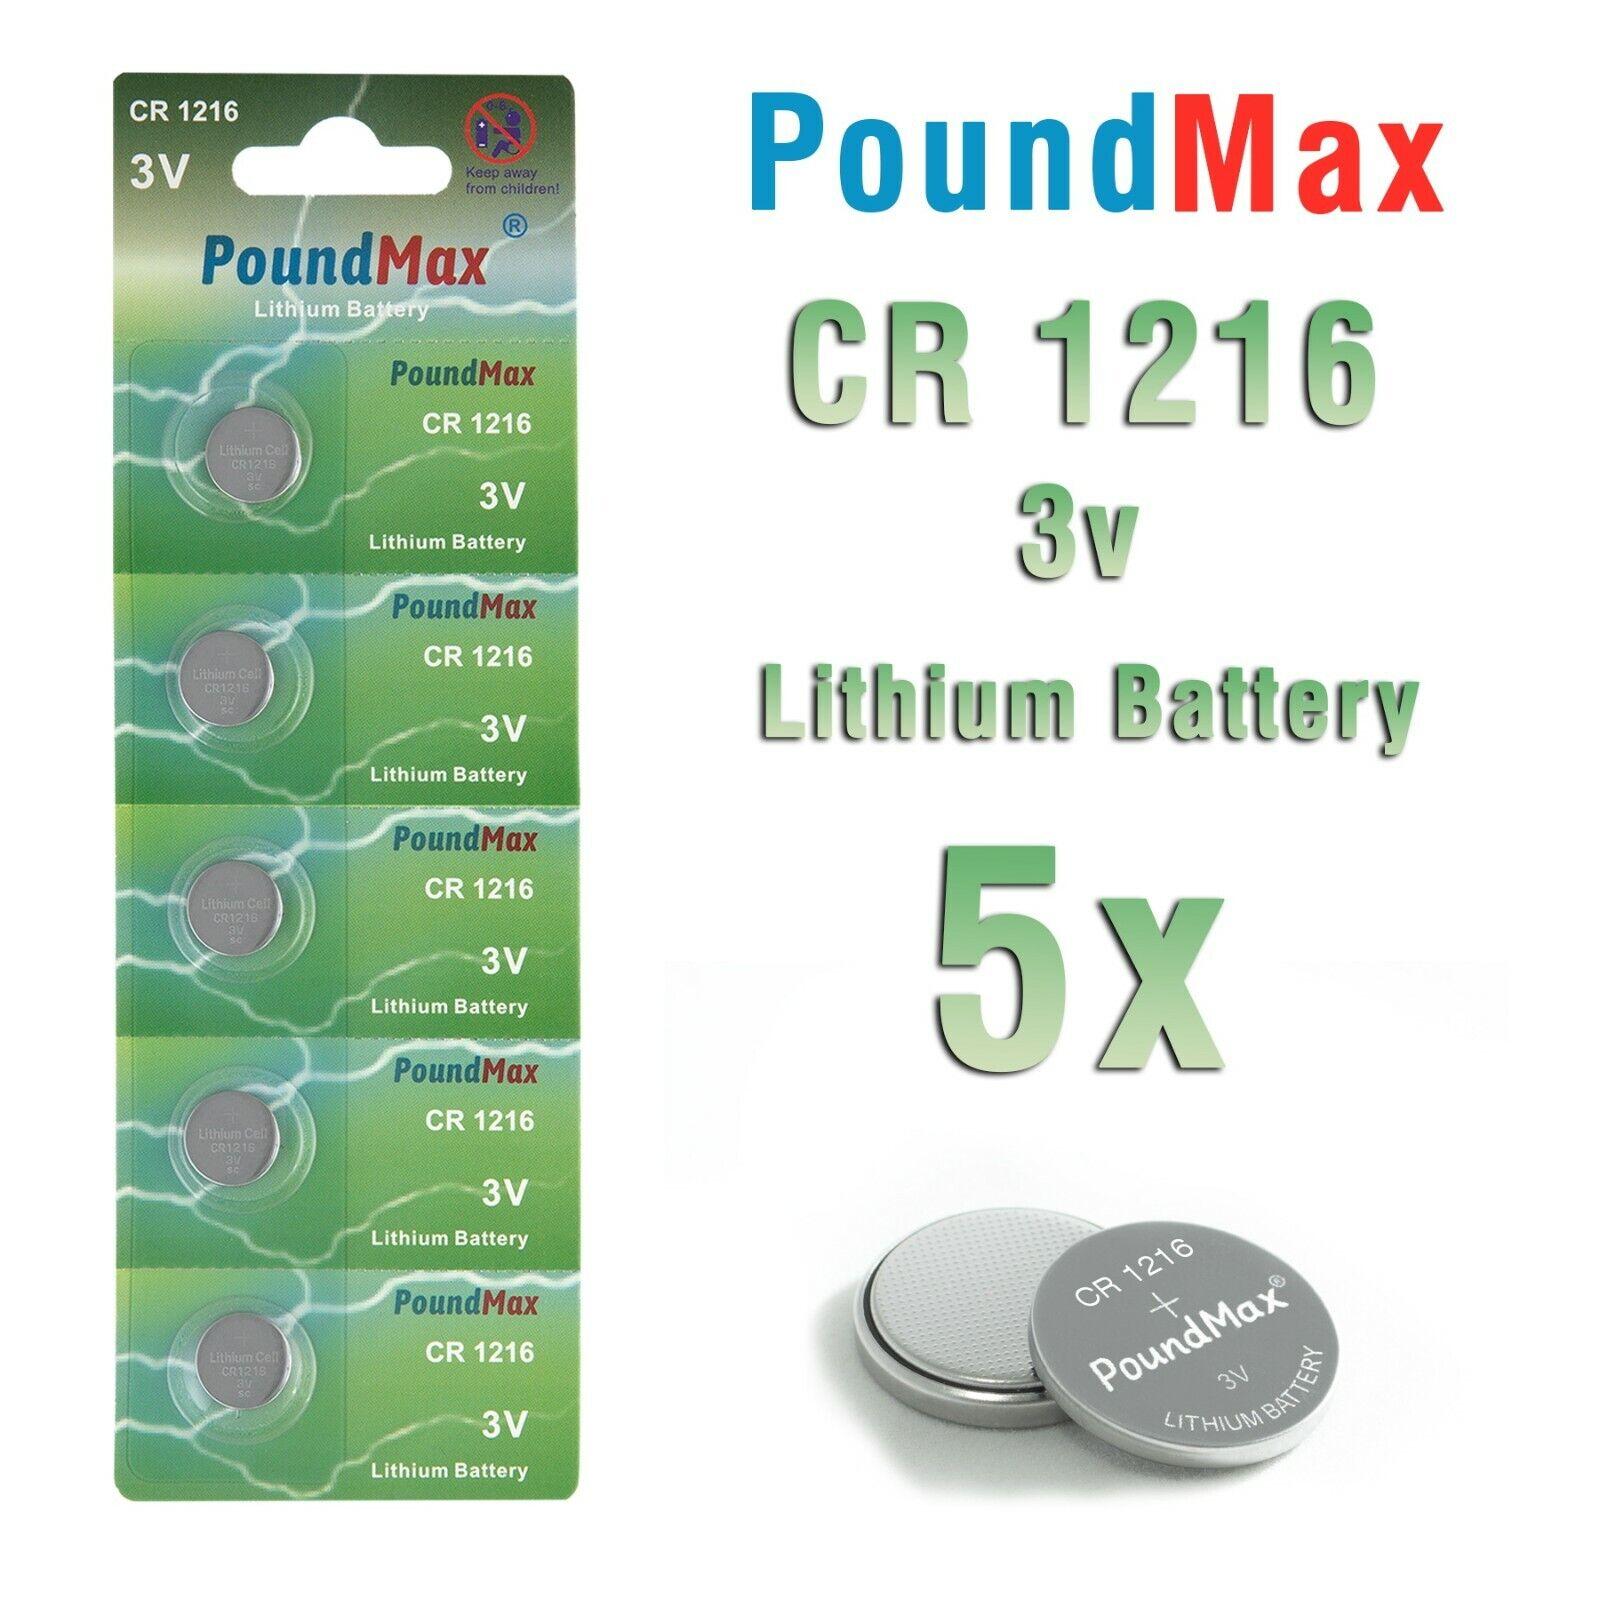 10 X 1216 CR1216 DL1216 KCR1216, BR1216 3V PoundMax Lithium Coin Cell Battery